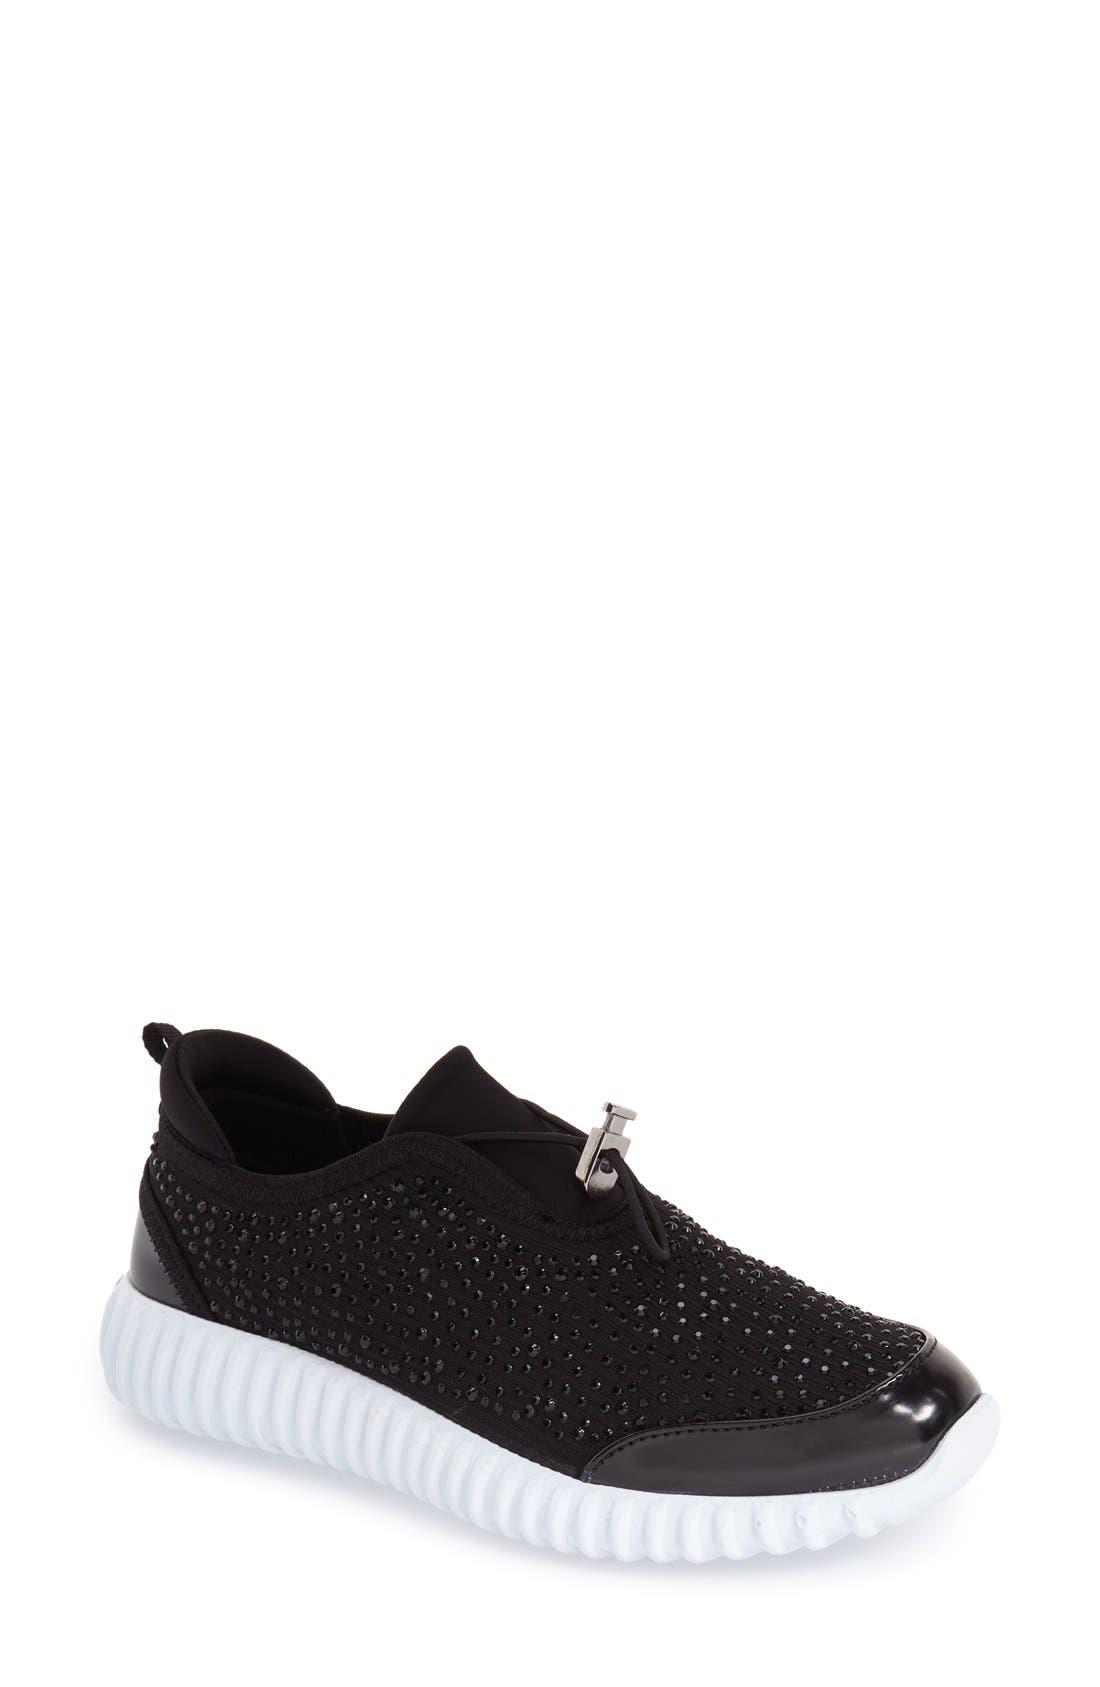 KENNETH COLE NEW YORK Dion Platform Sneaker